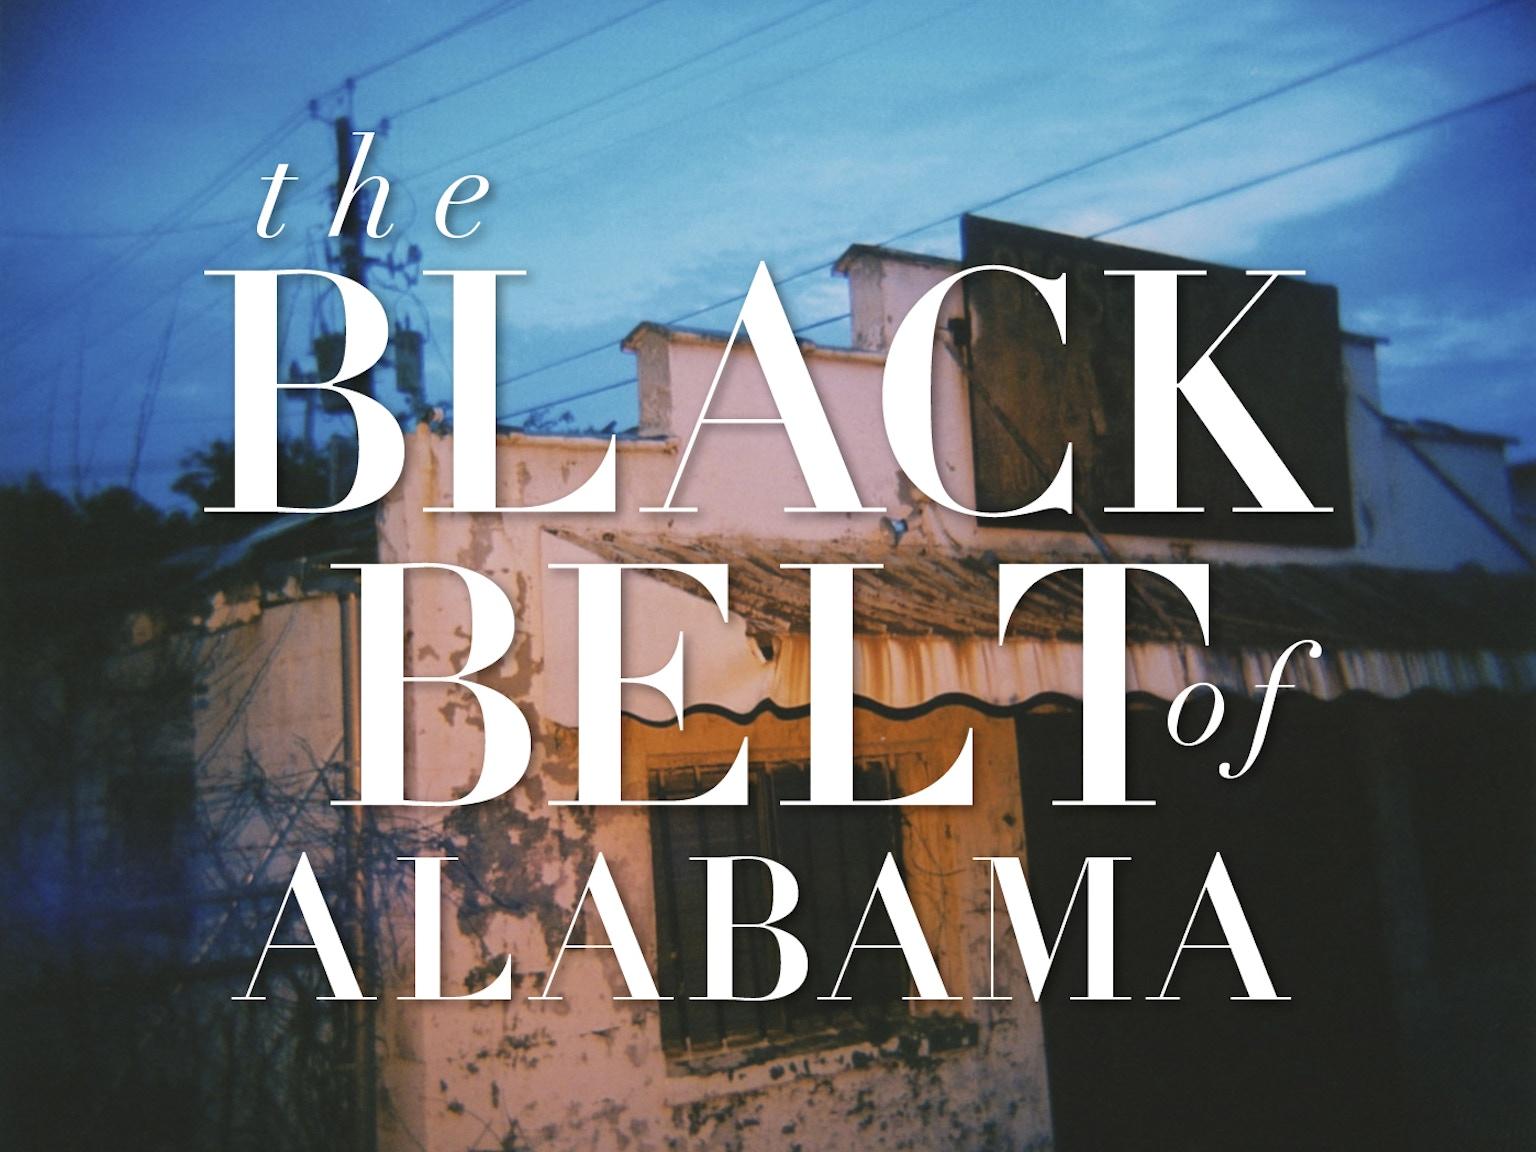 black belt essay taekwondo black belt essay get help from custom college essay